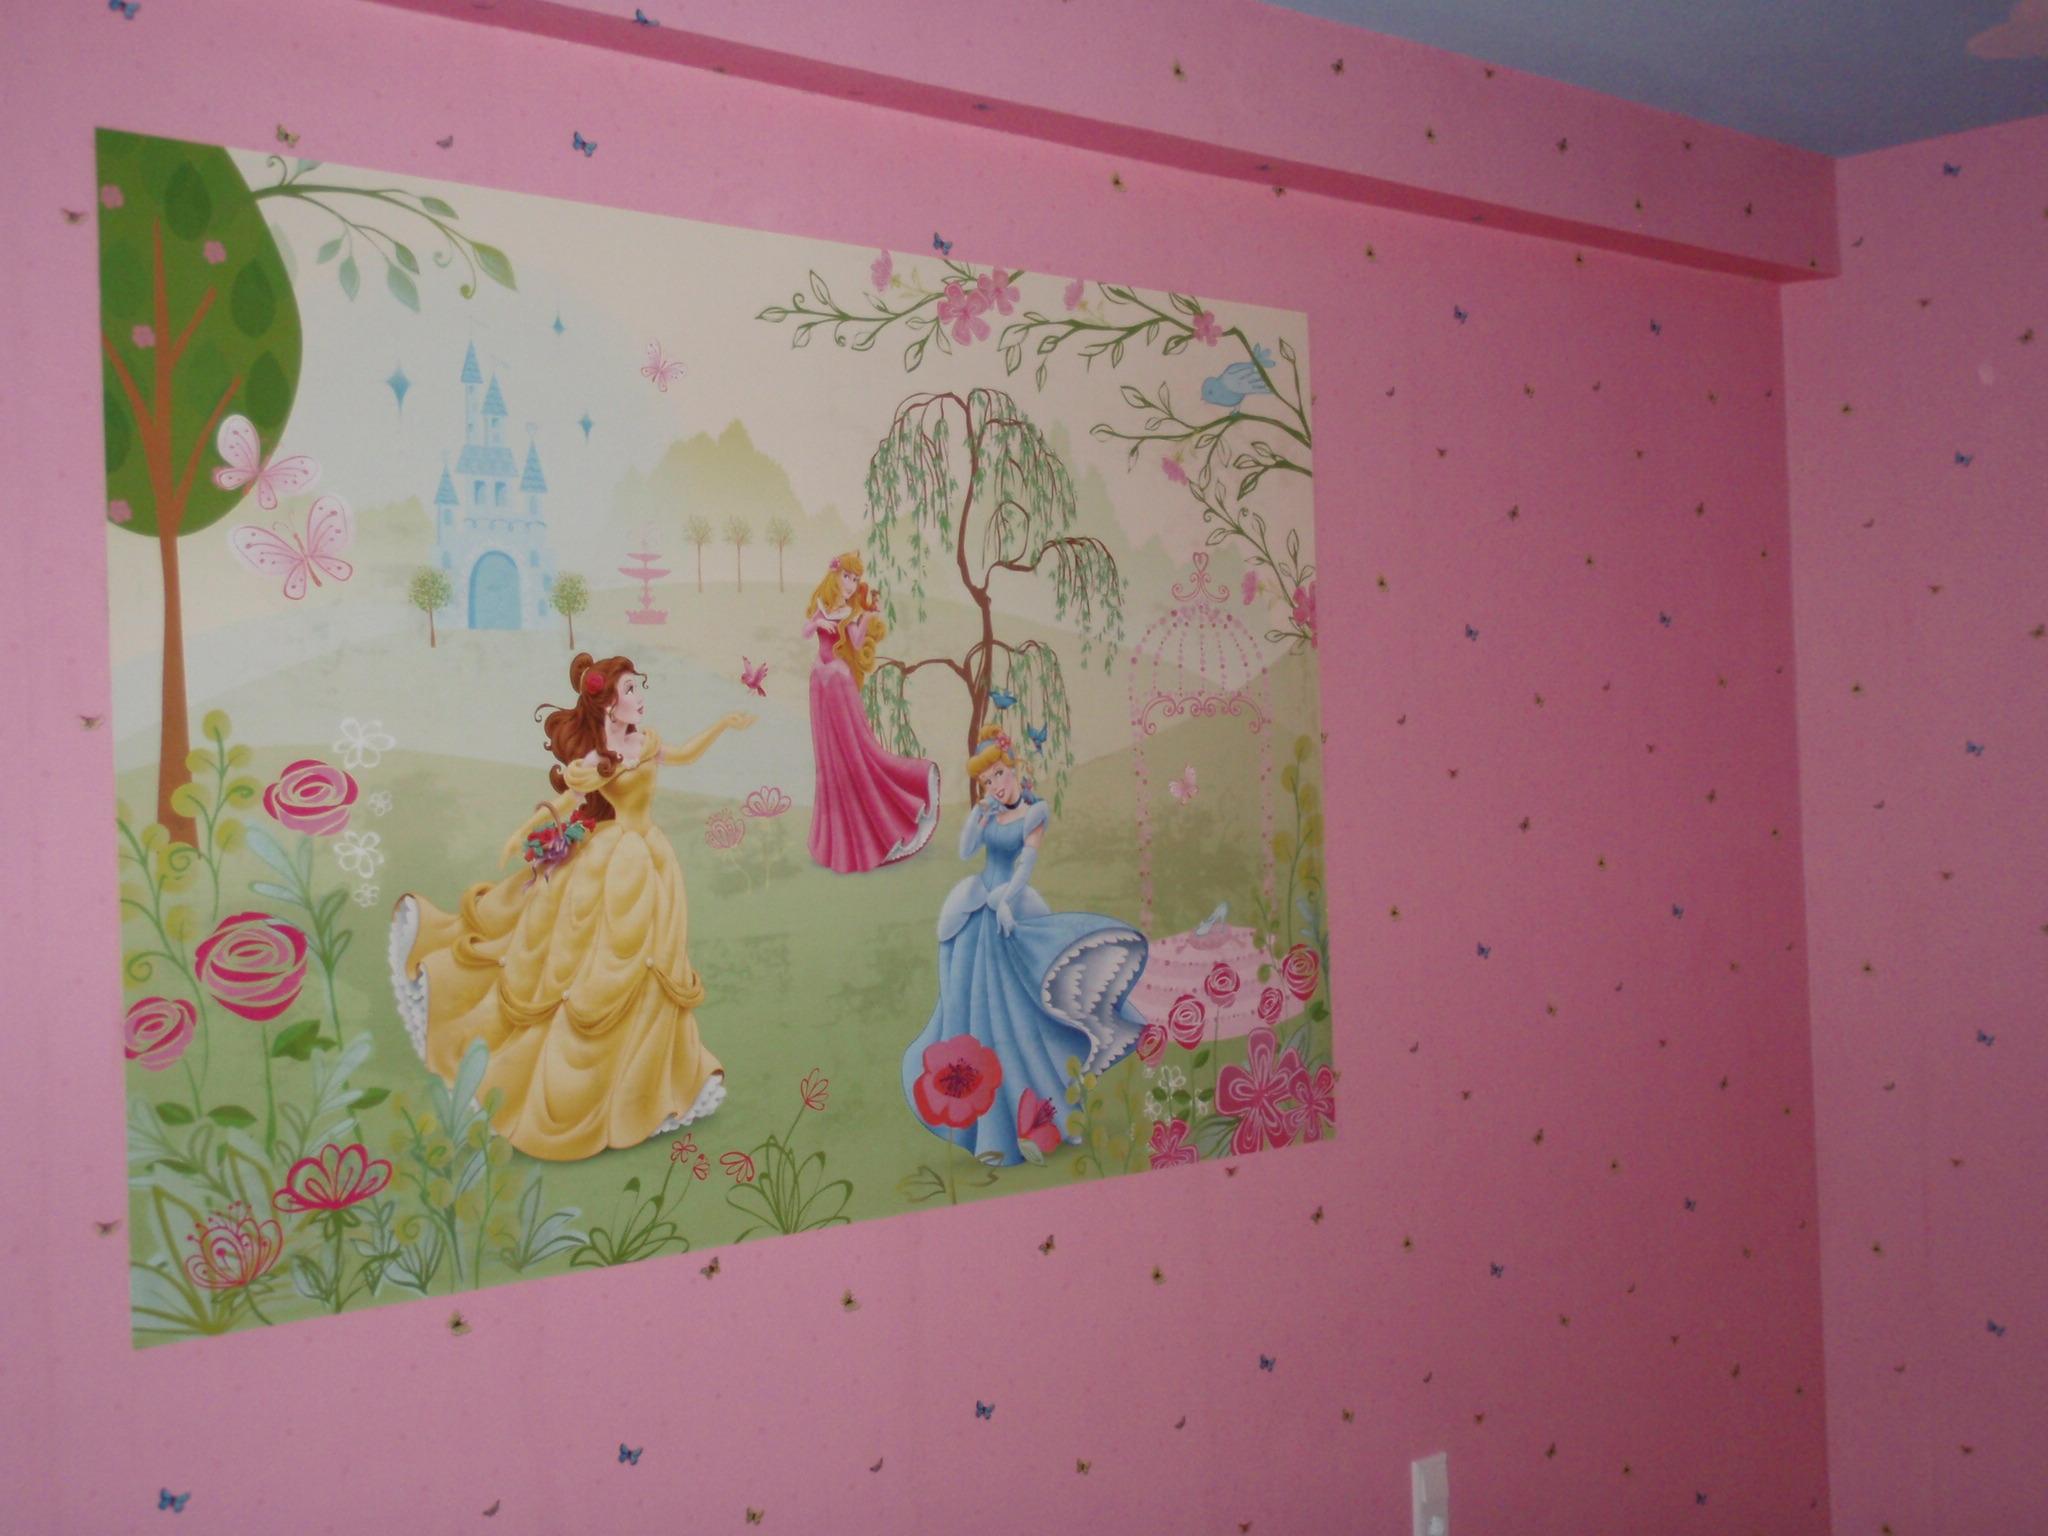 Kinderzimmer Tapete Schmetterling : Wandfl?chen vorbereitet, Makkulaturtapete, Tapete Schmetterling